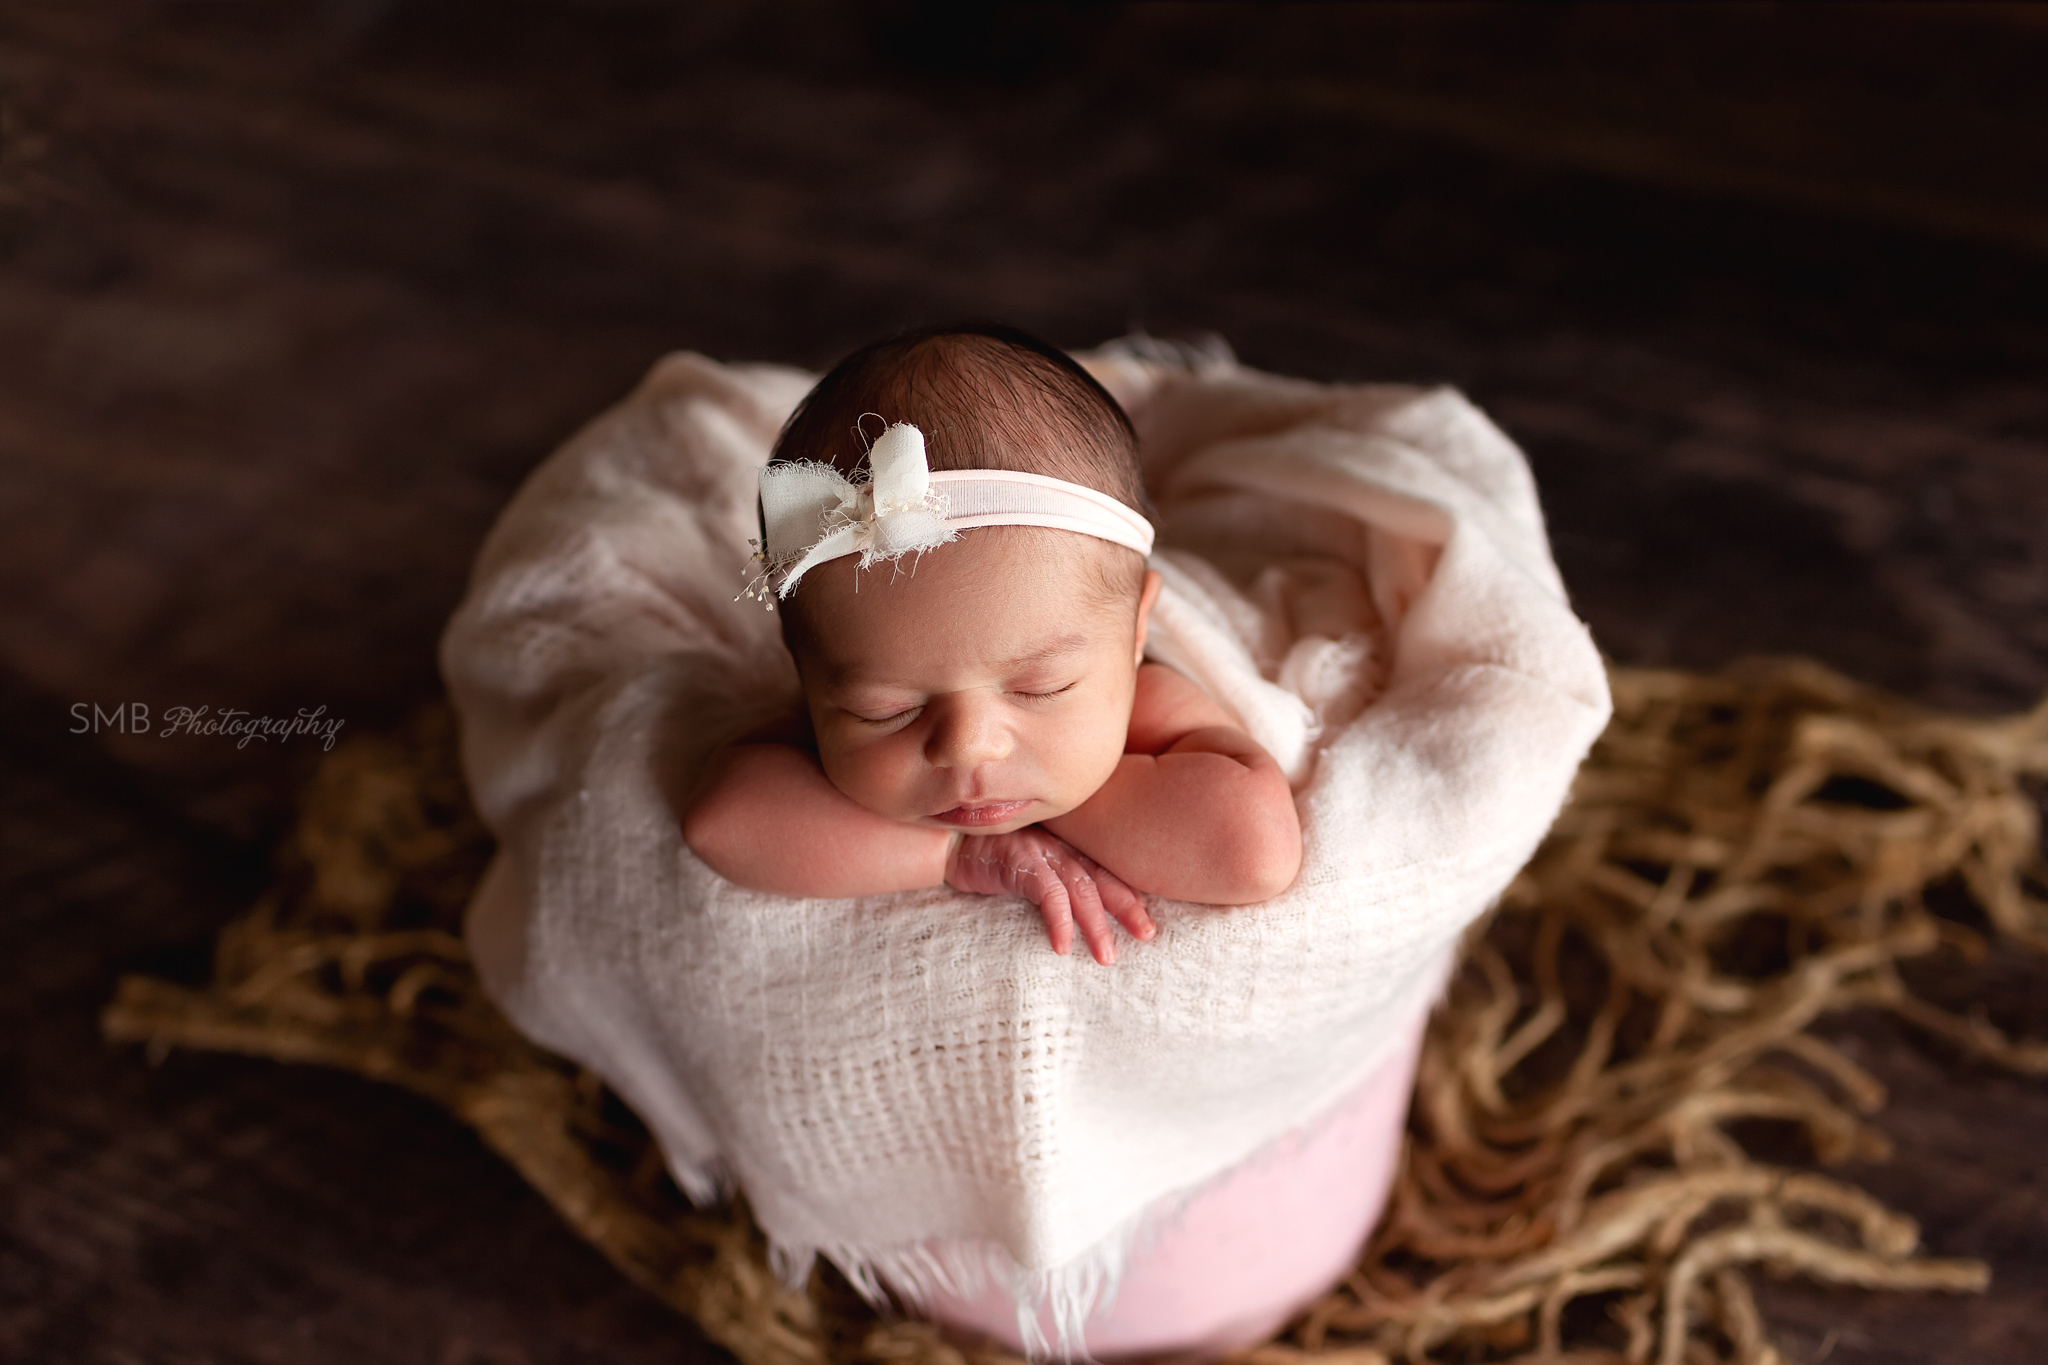 Baby girl wearing bow